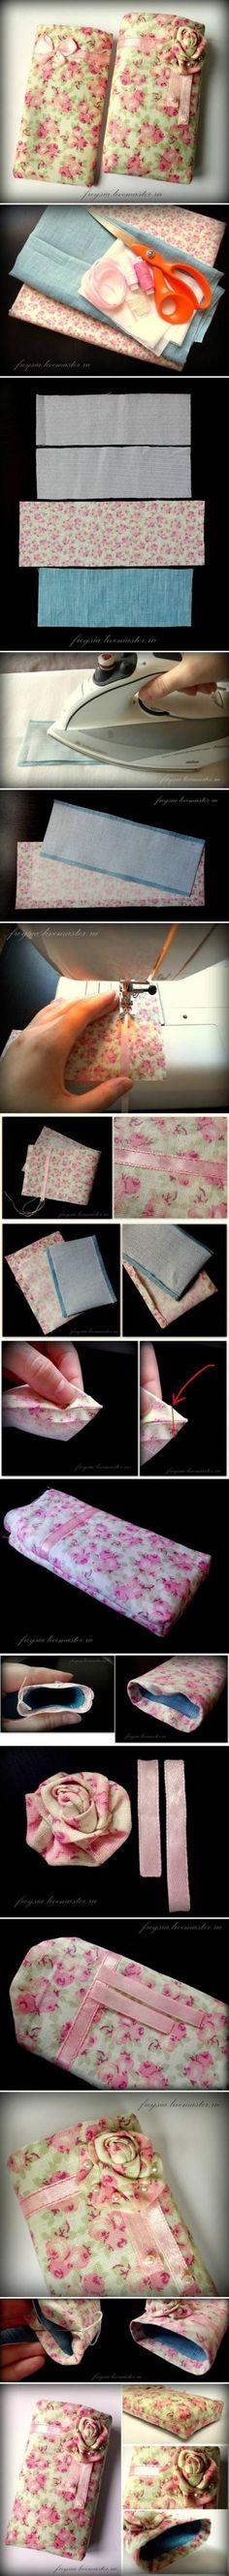 DIY Fabric Phone Case : DIY Pretty Mobile Phone Case